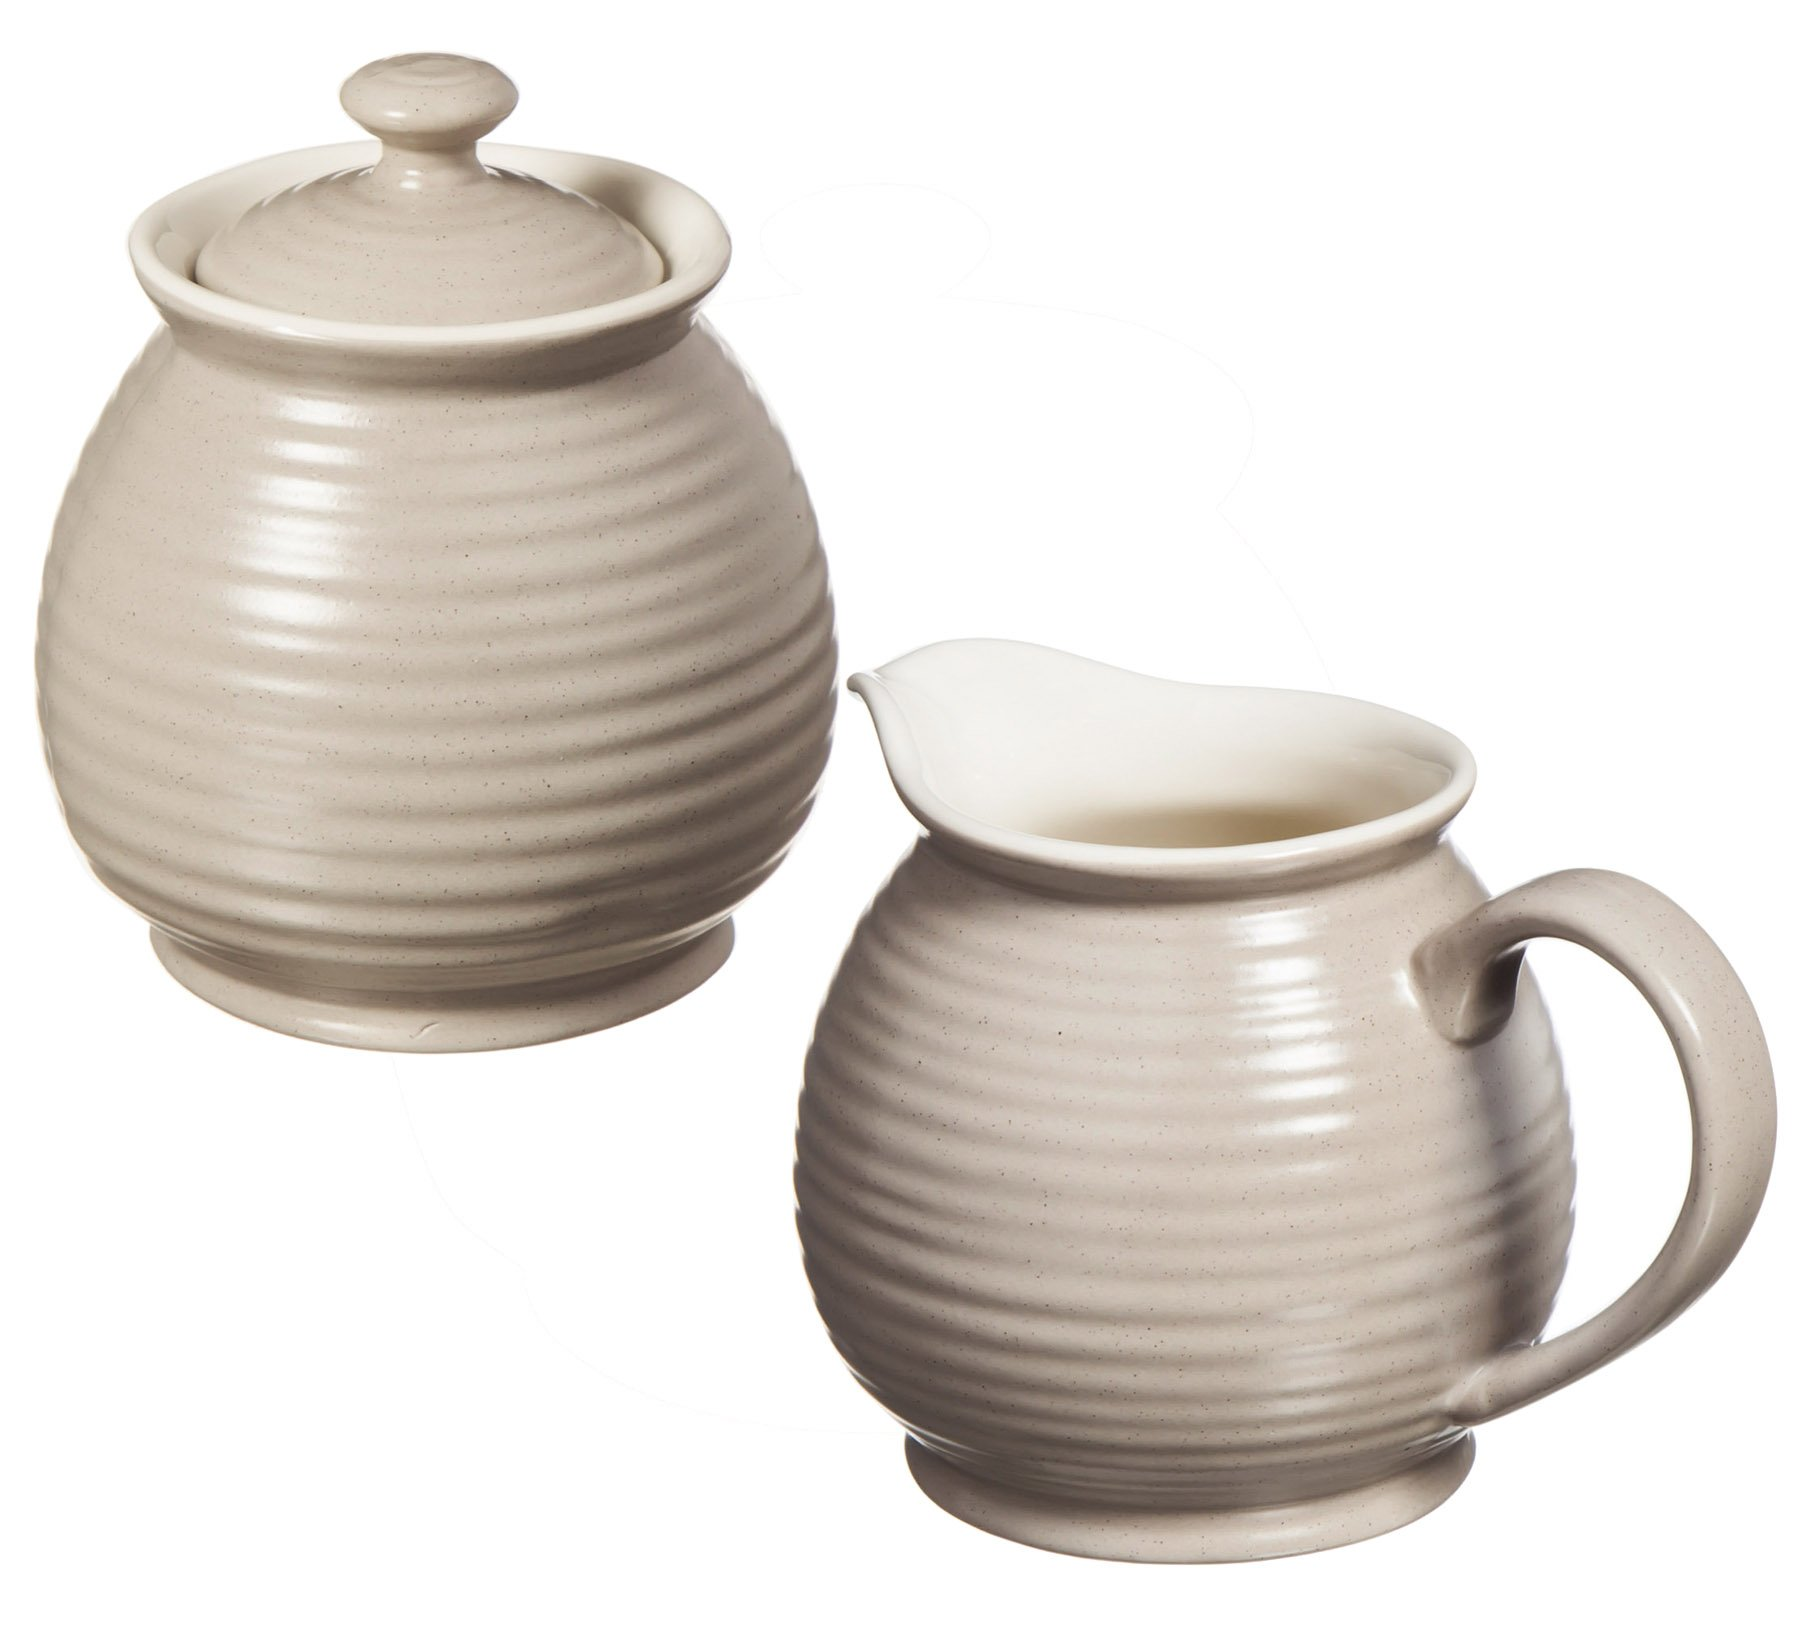 Cypress Home Shiloh Embossed Ceramic Sugar Pot and Creamer, Set of 2